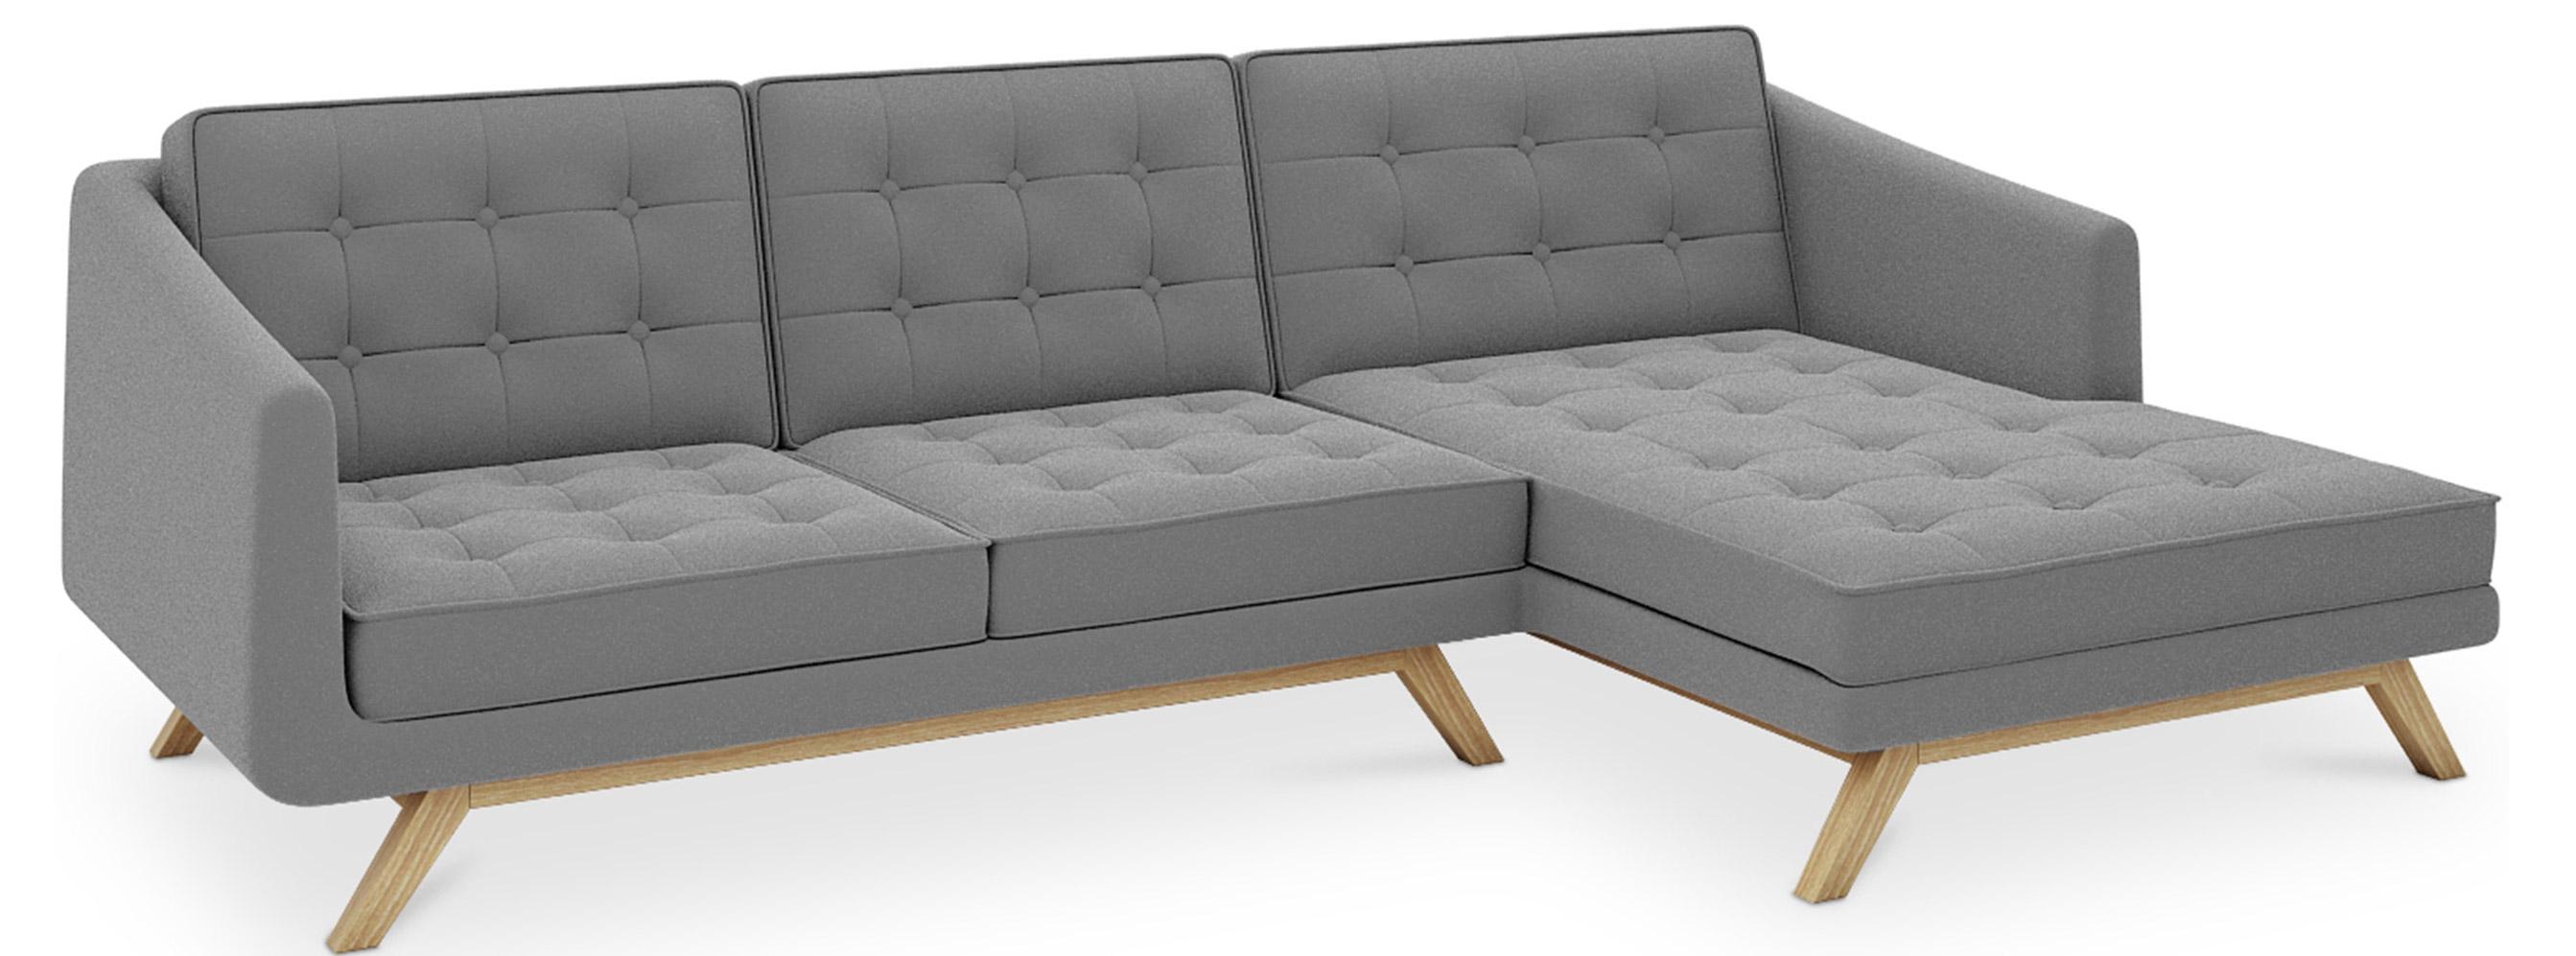 canap angle droit tissu gris moderne. Black Bedroom Furniture Sets. Home Design Ideas